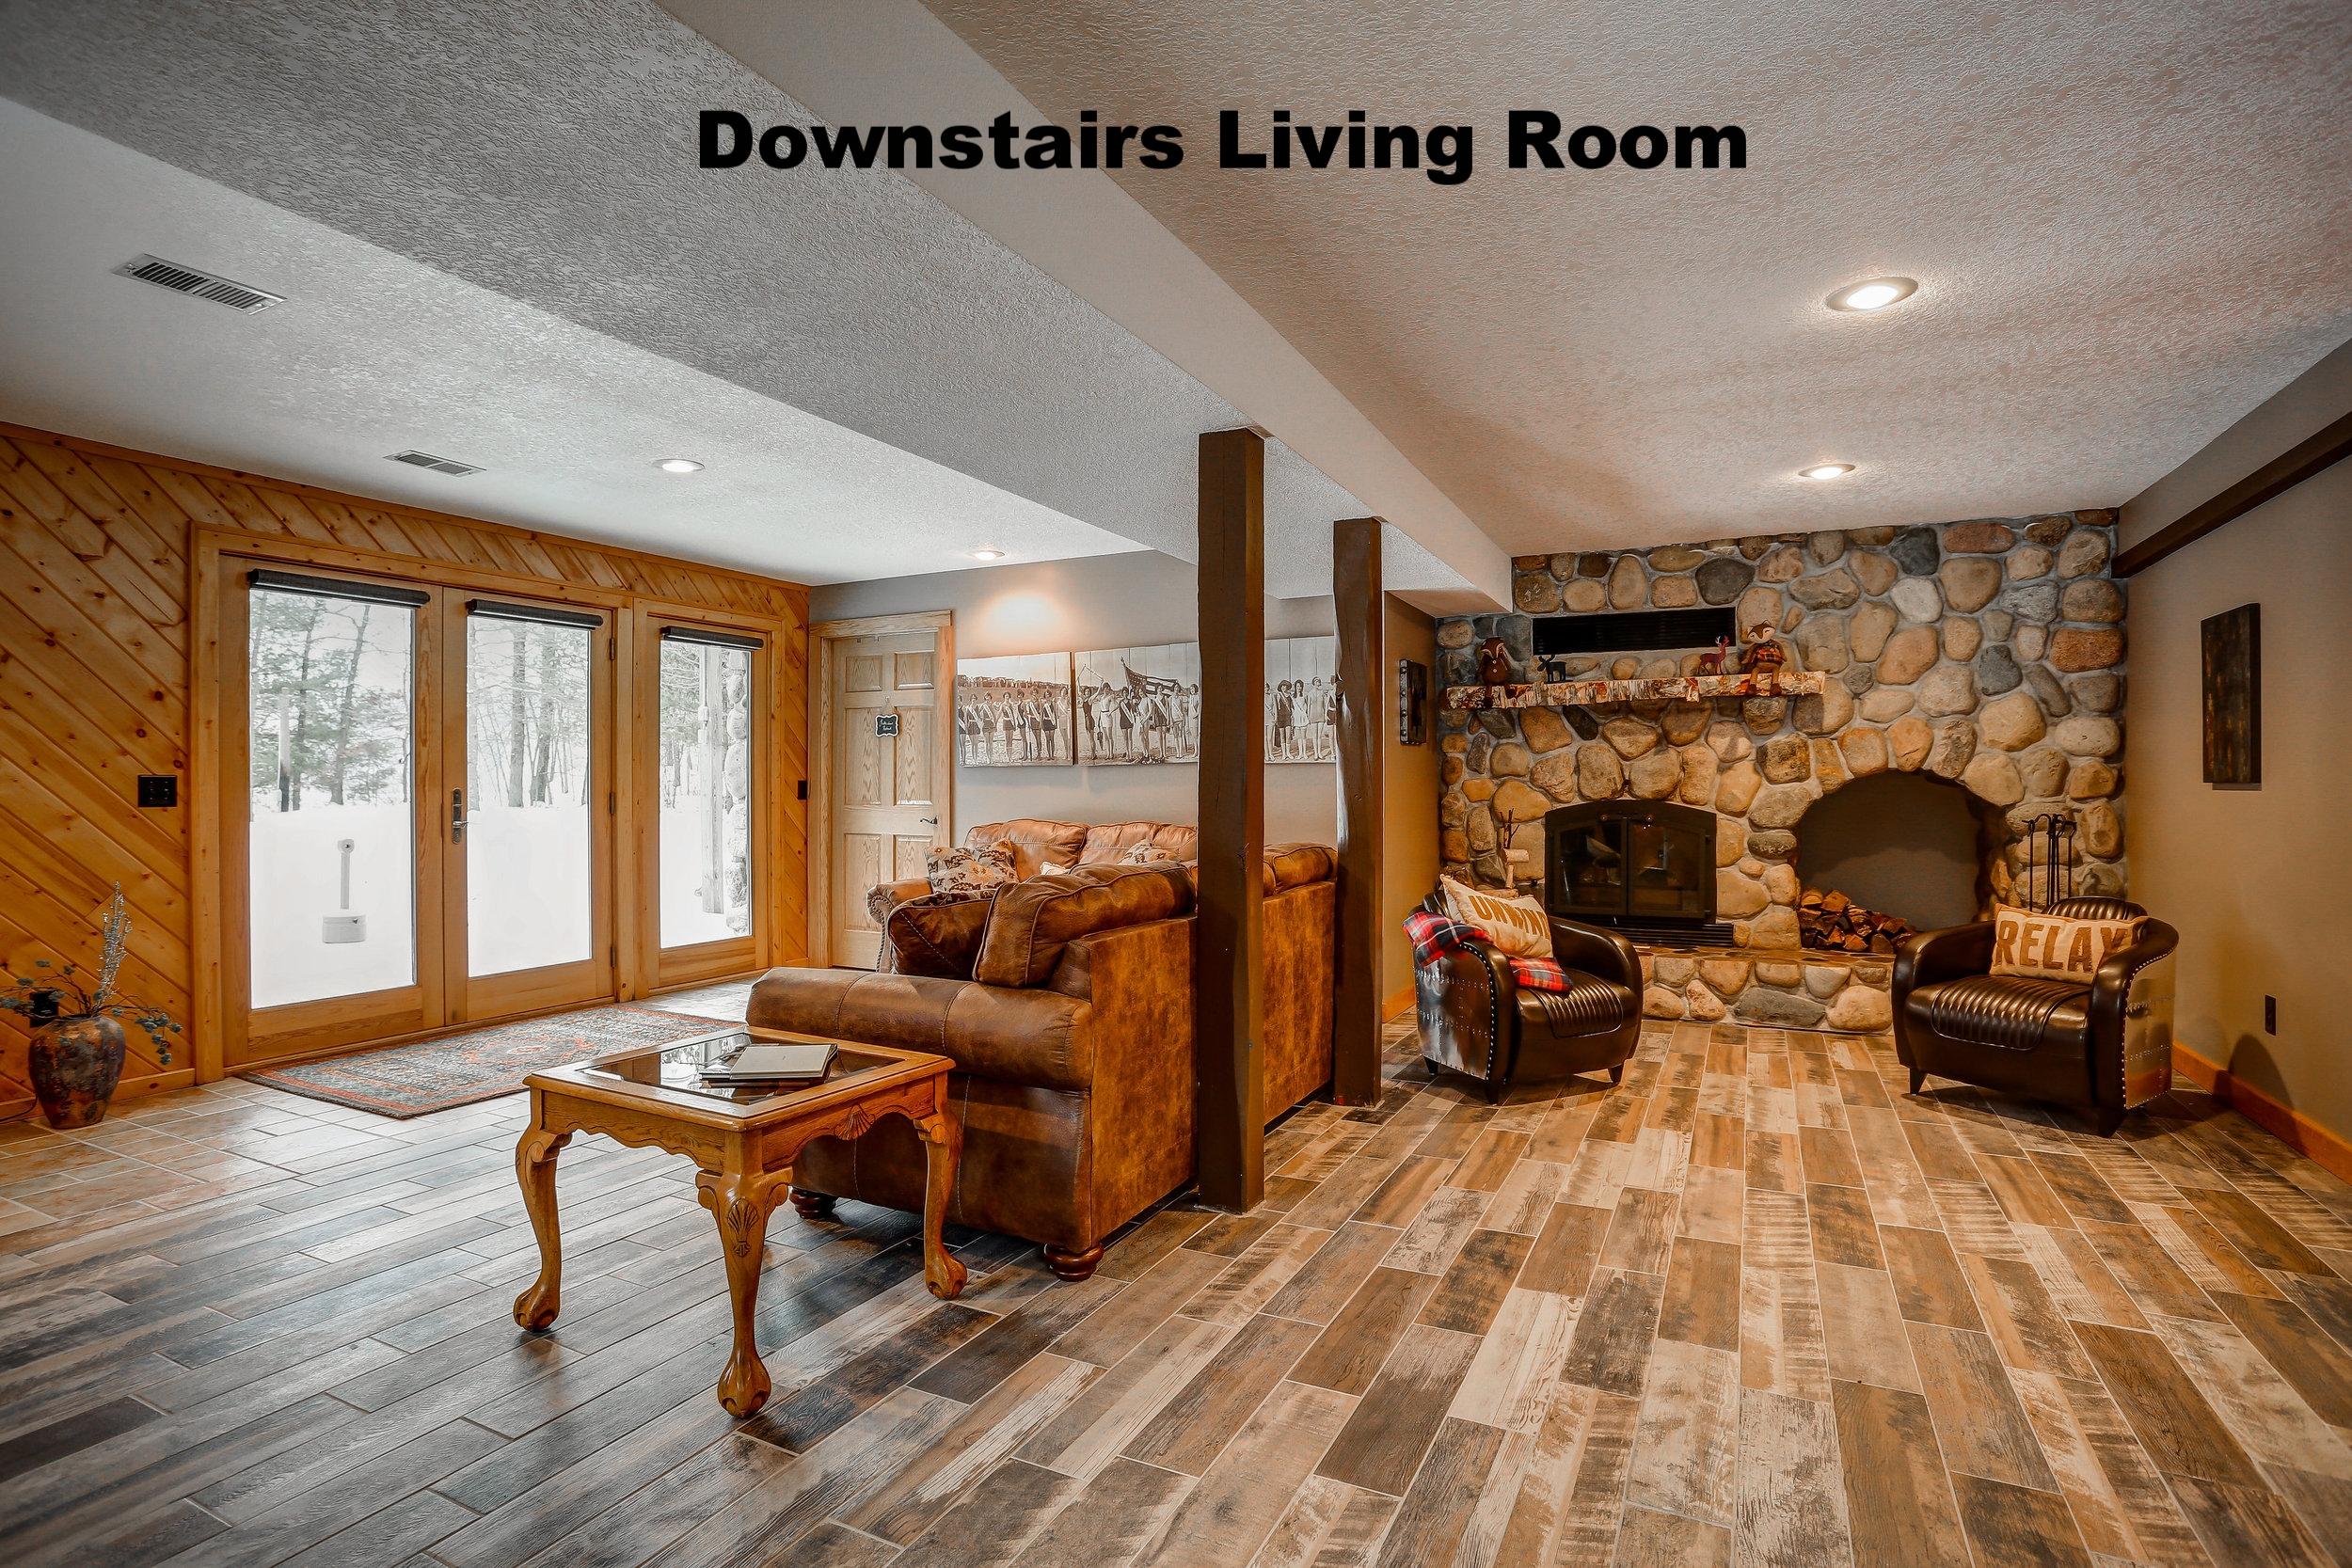 Downstairs-living-room-fireplace.jpg